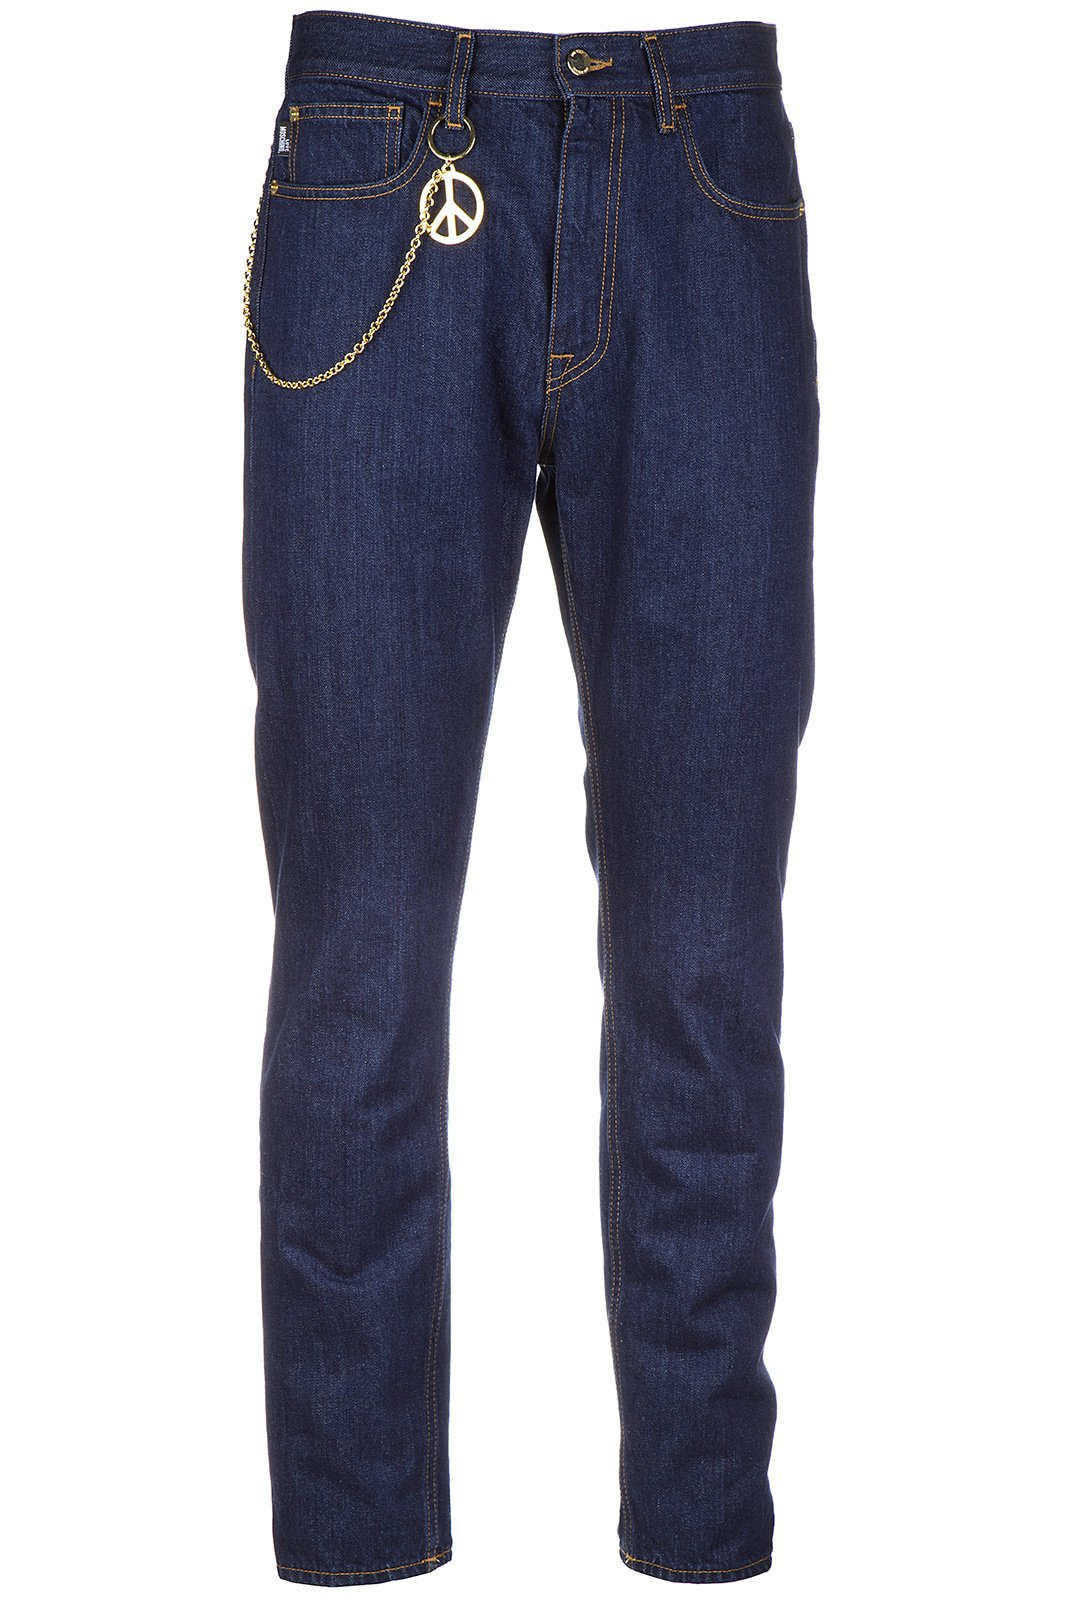 Love Moschino Men's Jeans Denim Blu US Size 32 (US 32) M Q 442 80 T 8632 00